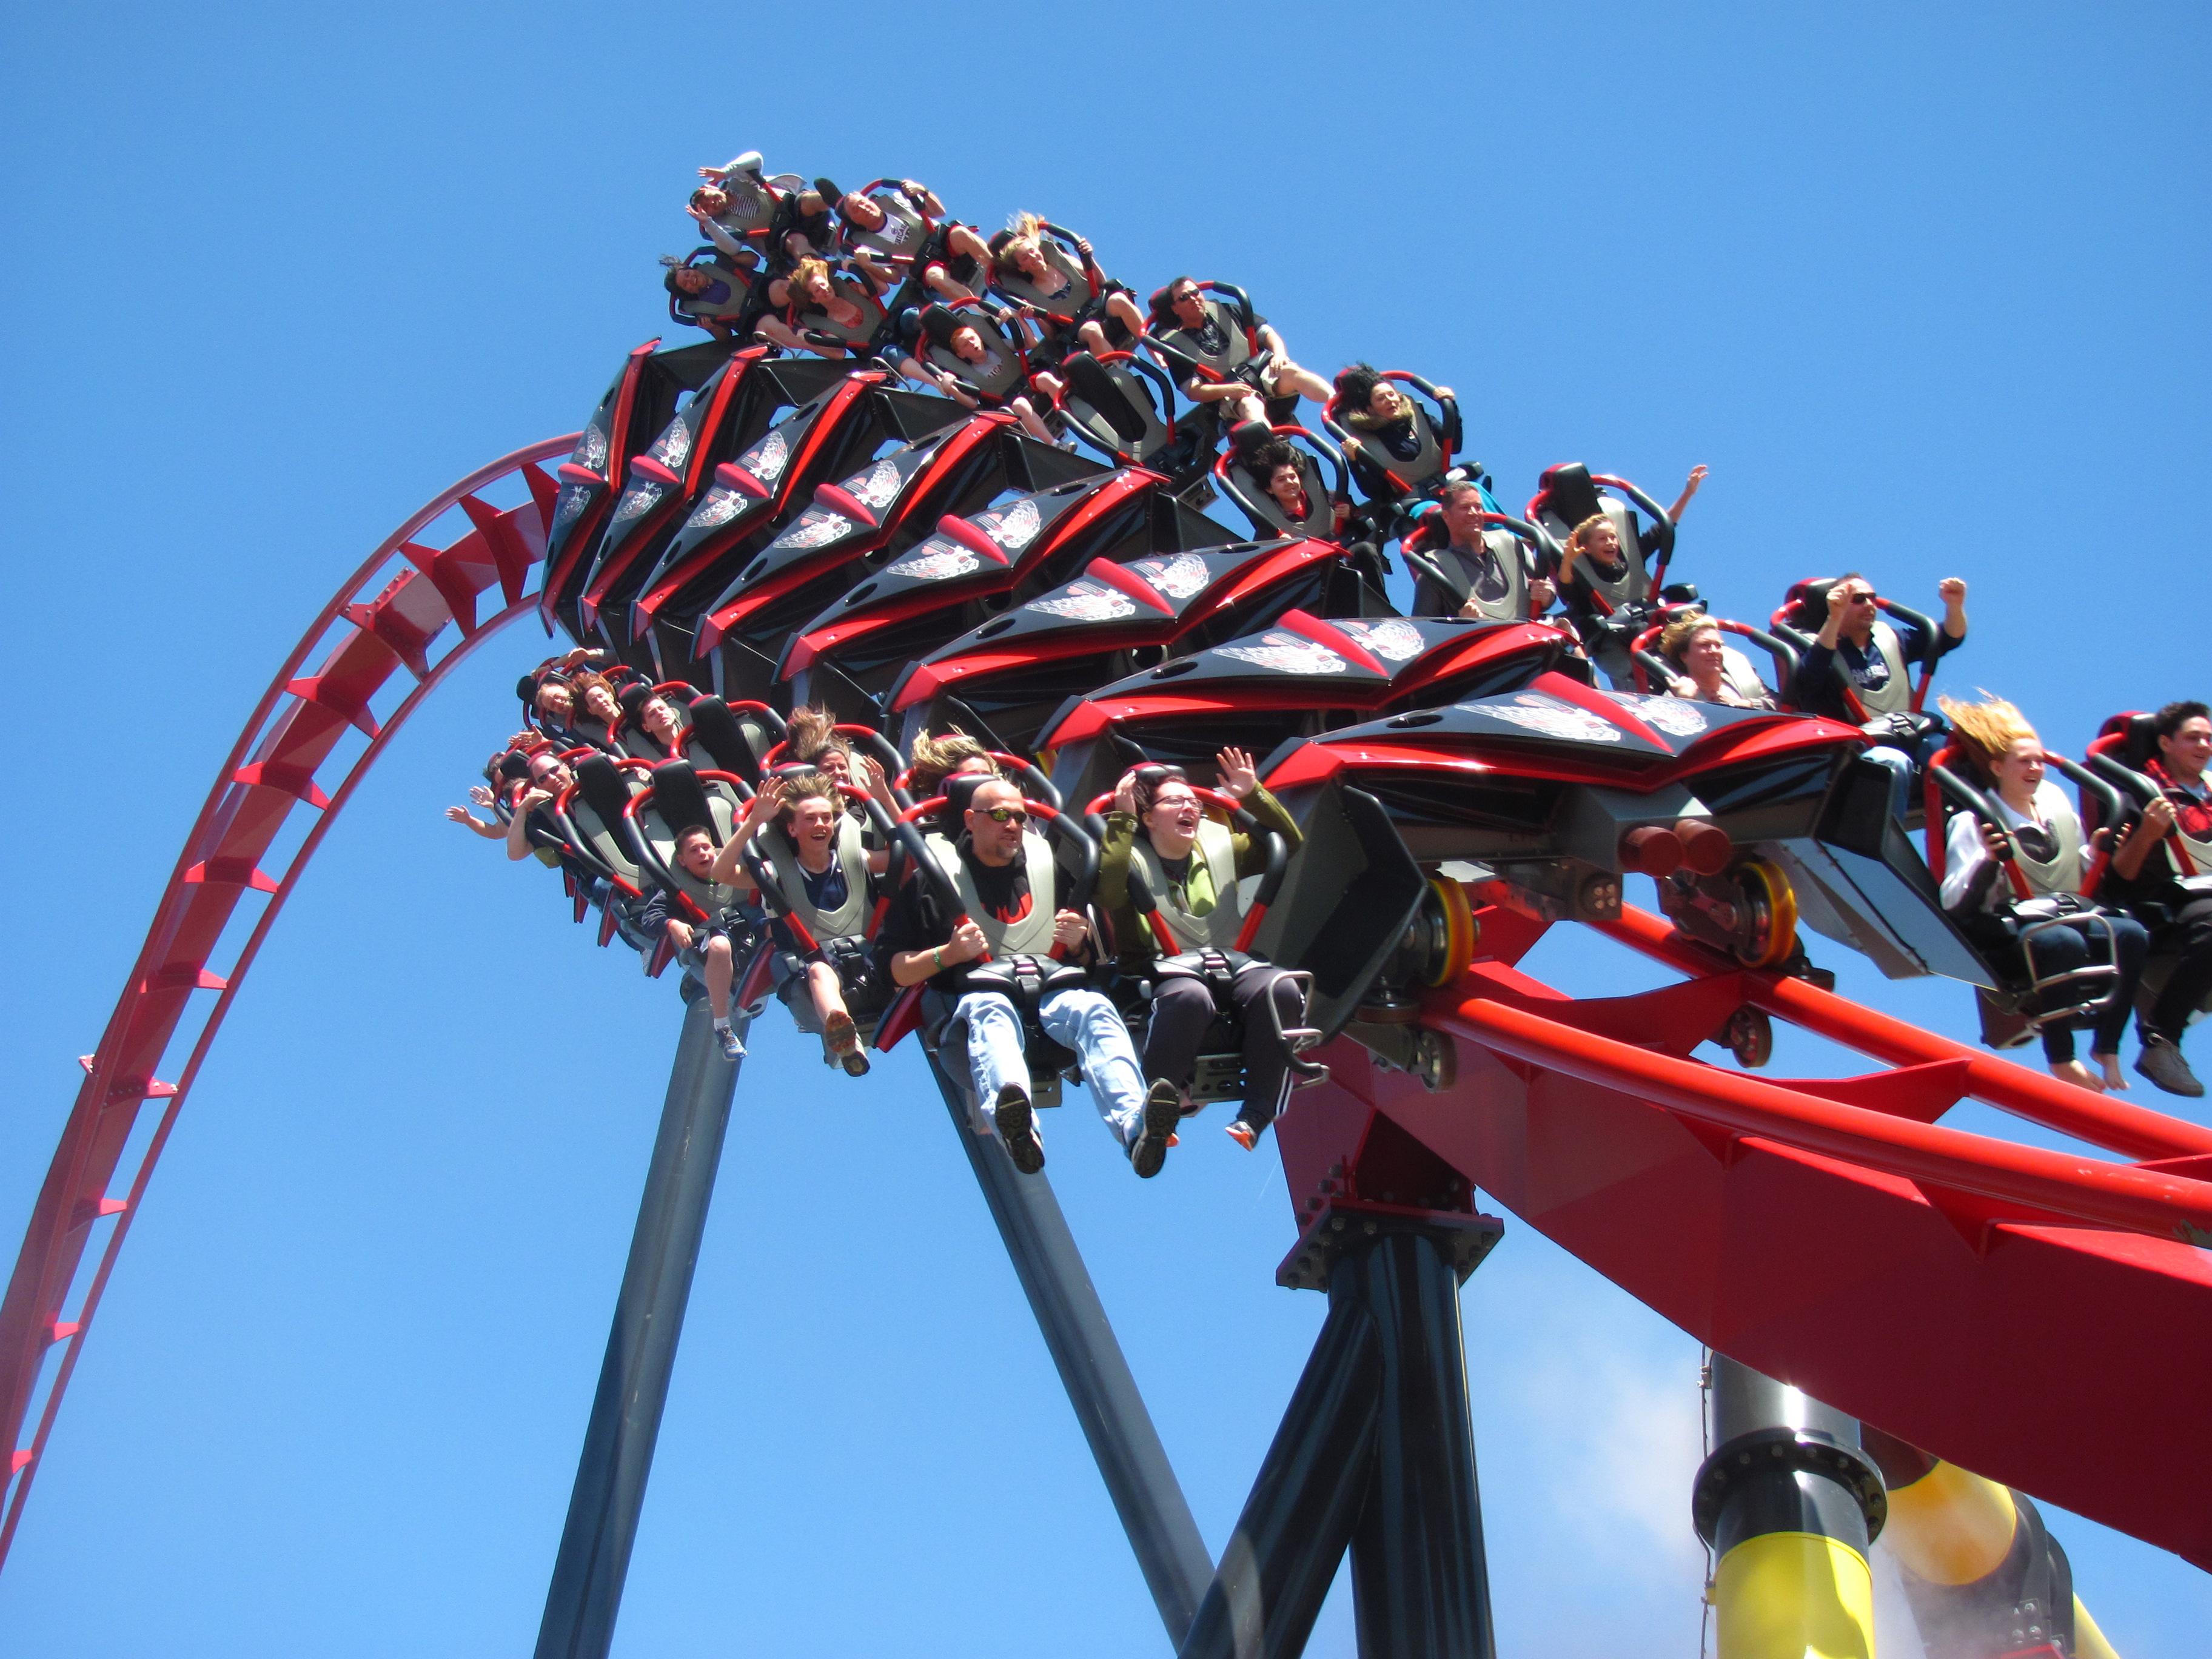 Track   Roller Coaster Wiki   FANDOM powered by Wikia